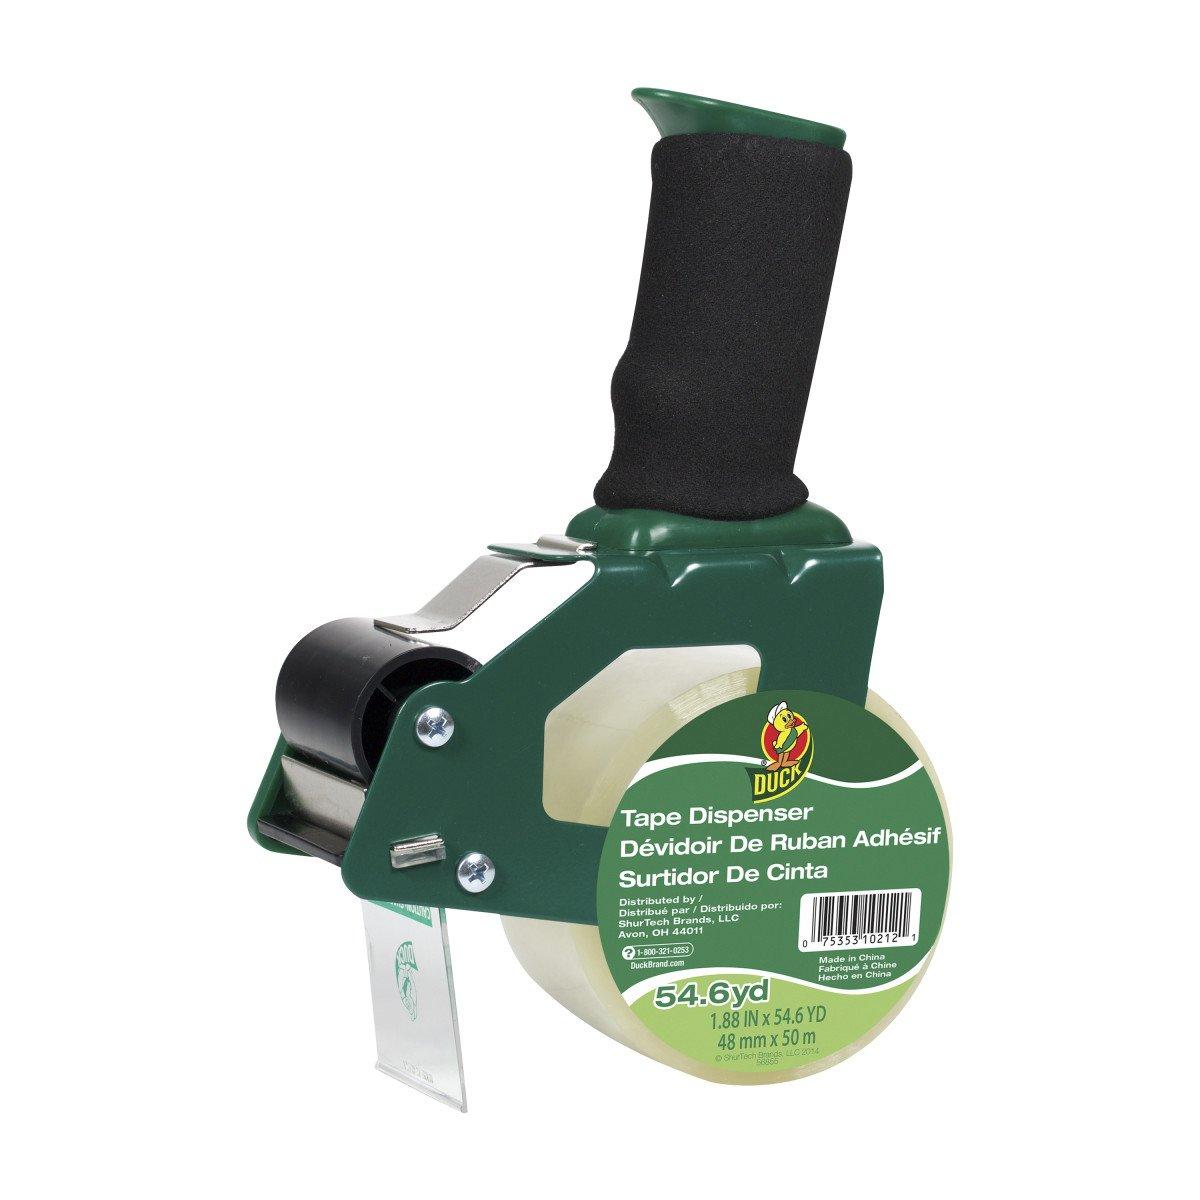 Duck Brand Standard Tape Gun with Foam Handle, Includes 1 Roll of 54 Yard Standard Tape (669332)